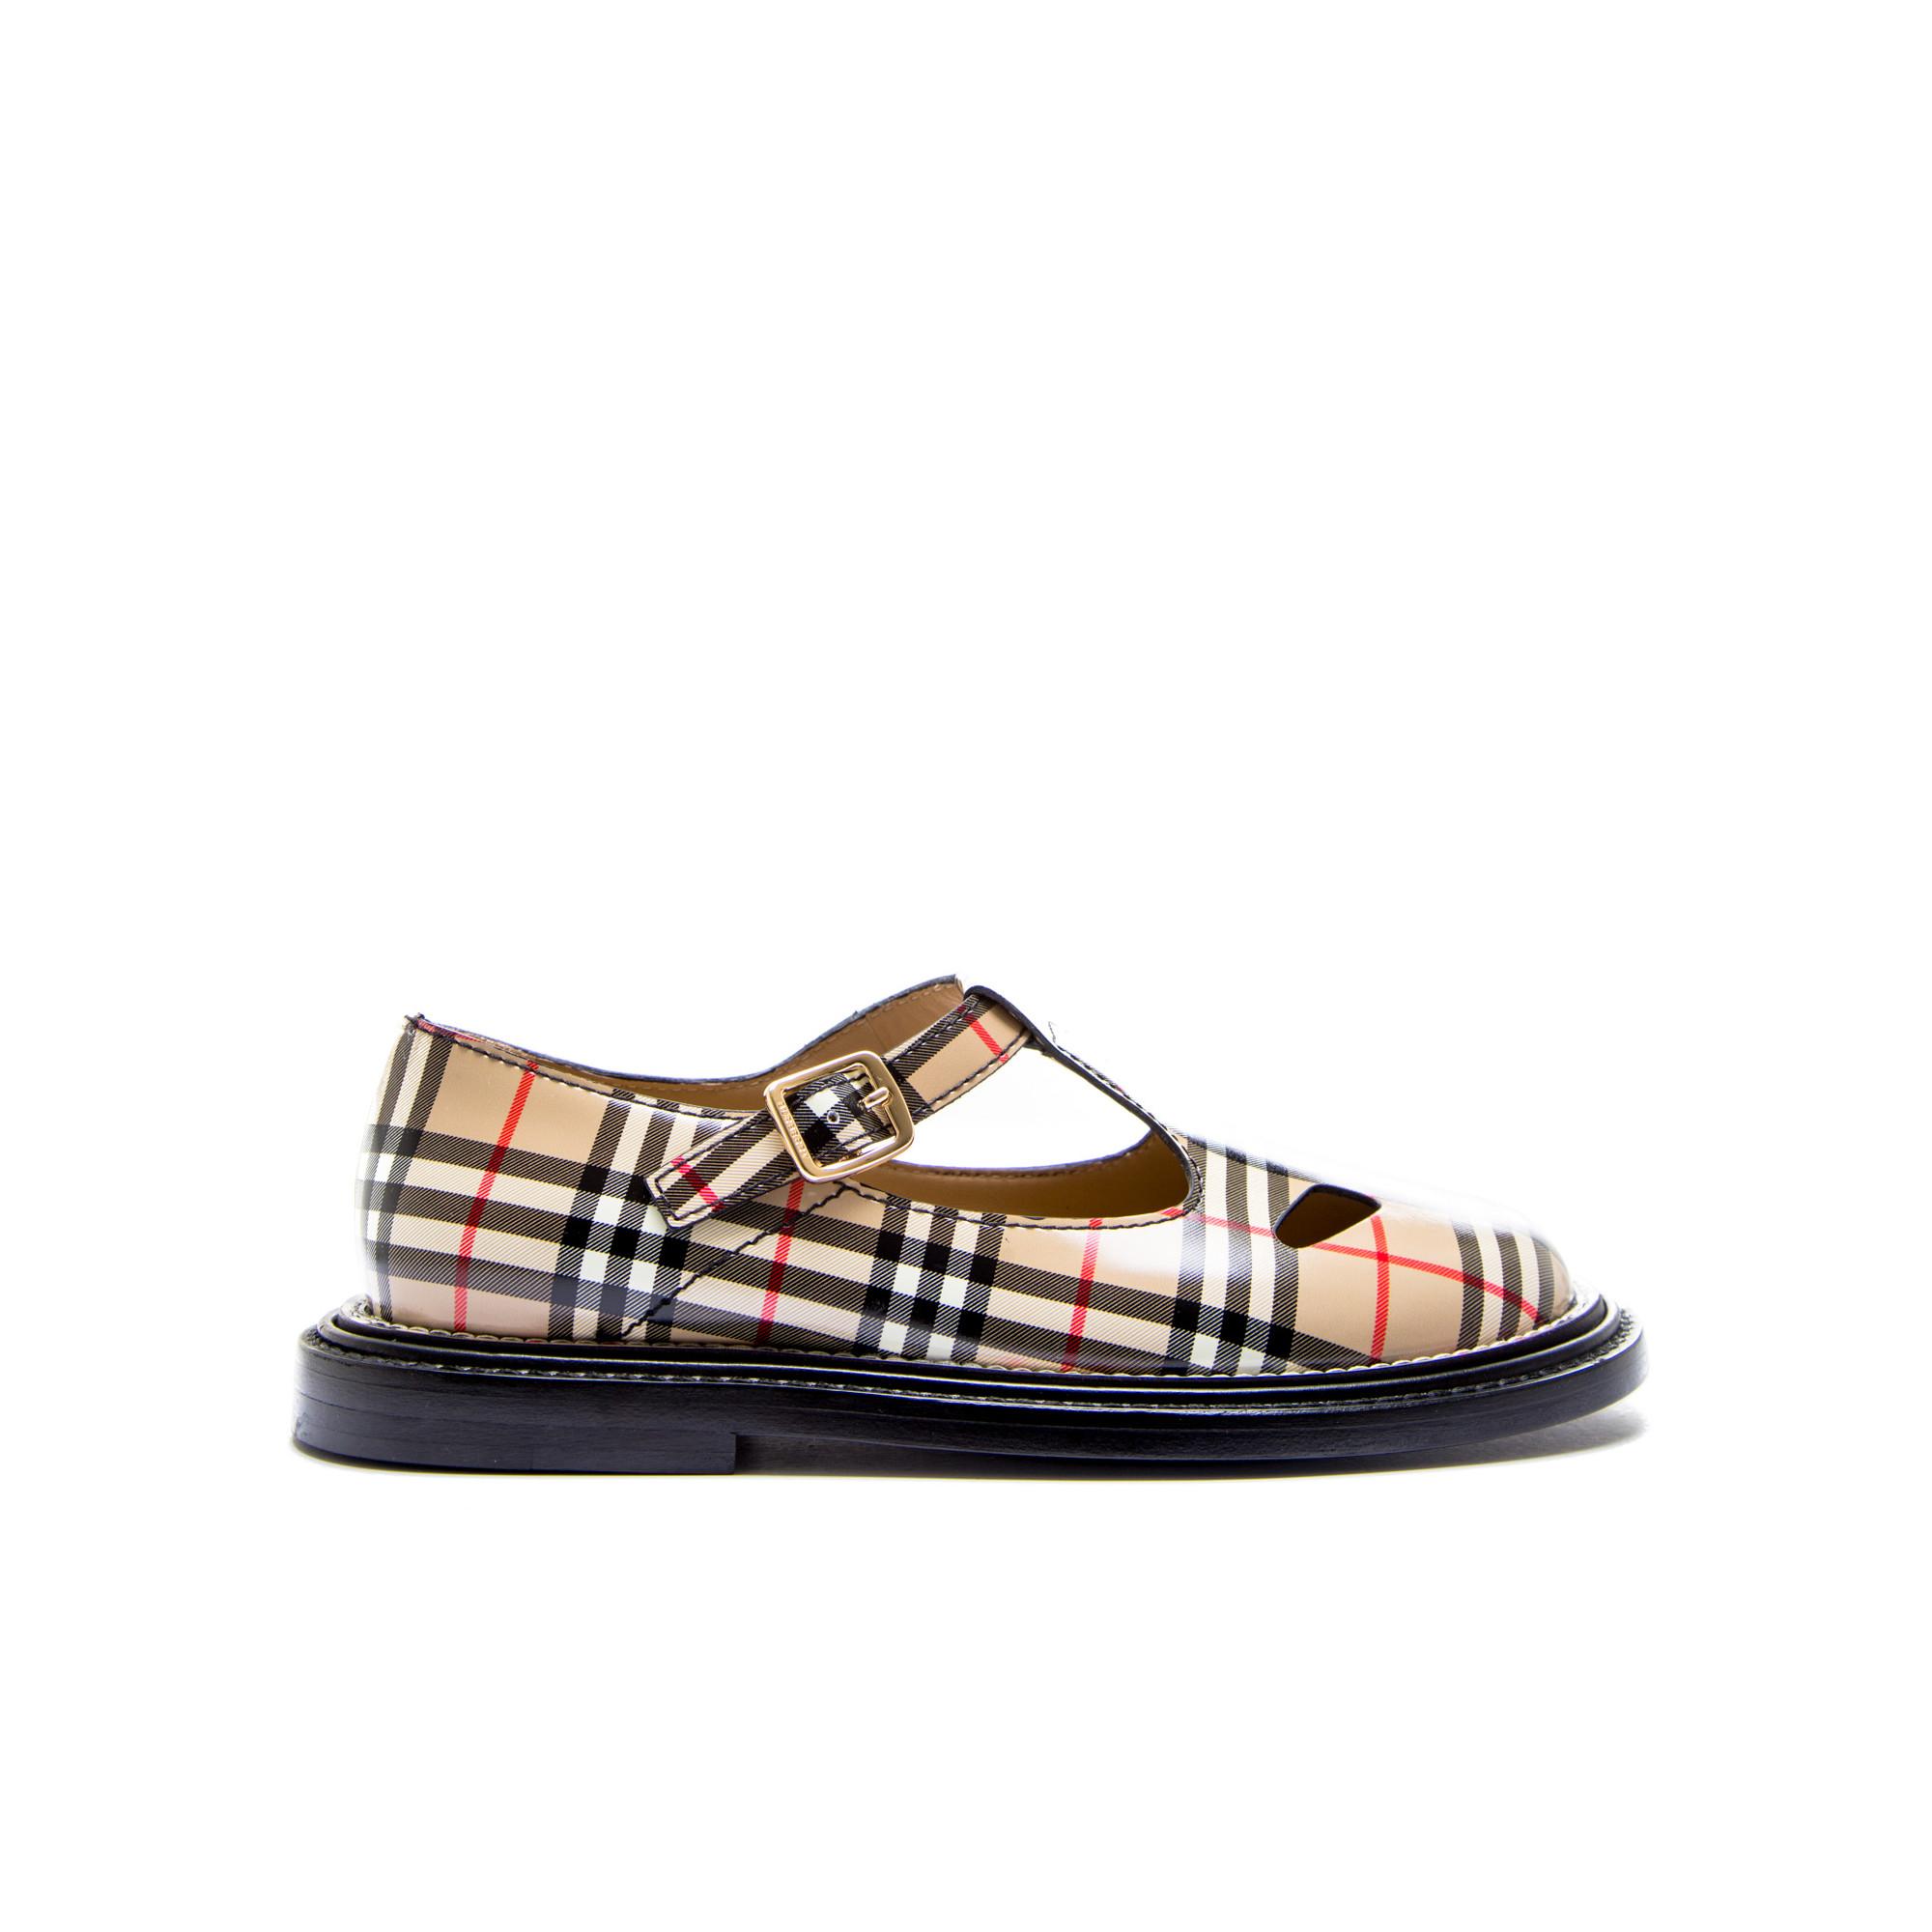 ae96e26016f Burberry hannie sandals beige8010911 1006 a7026